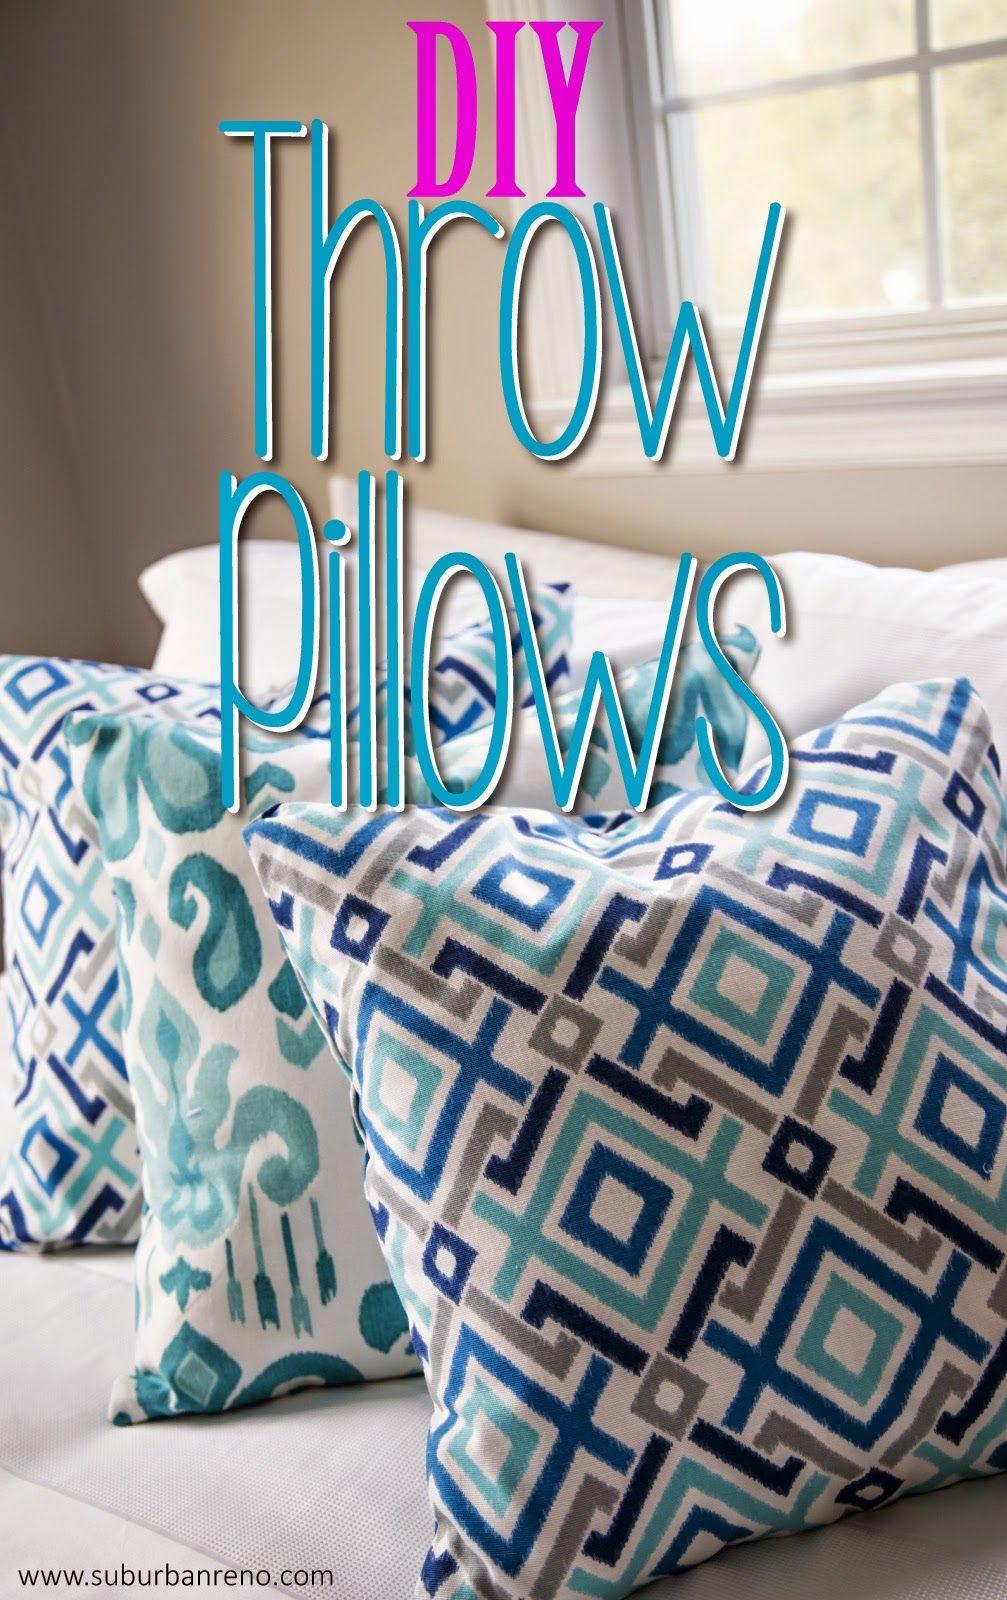 Diy Throw Pillows No Sewing Necessary Diy Throw Pillows Throw